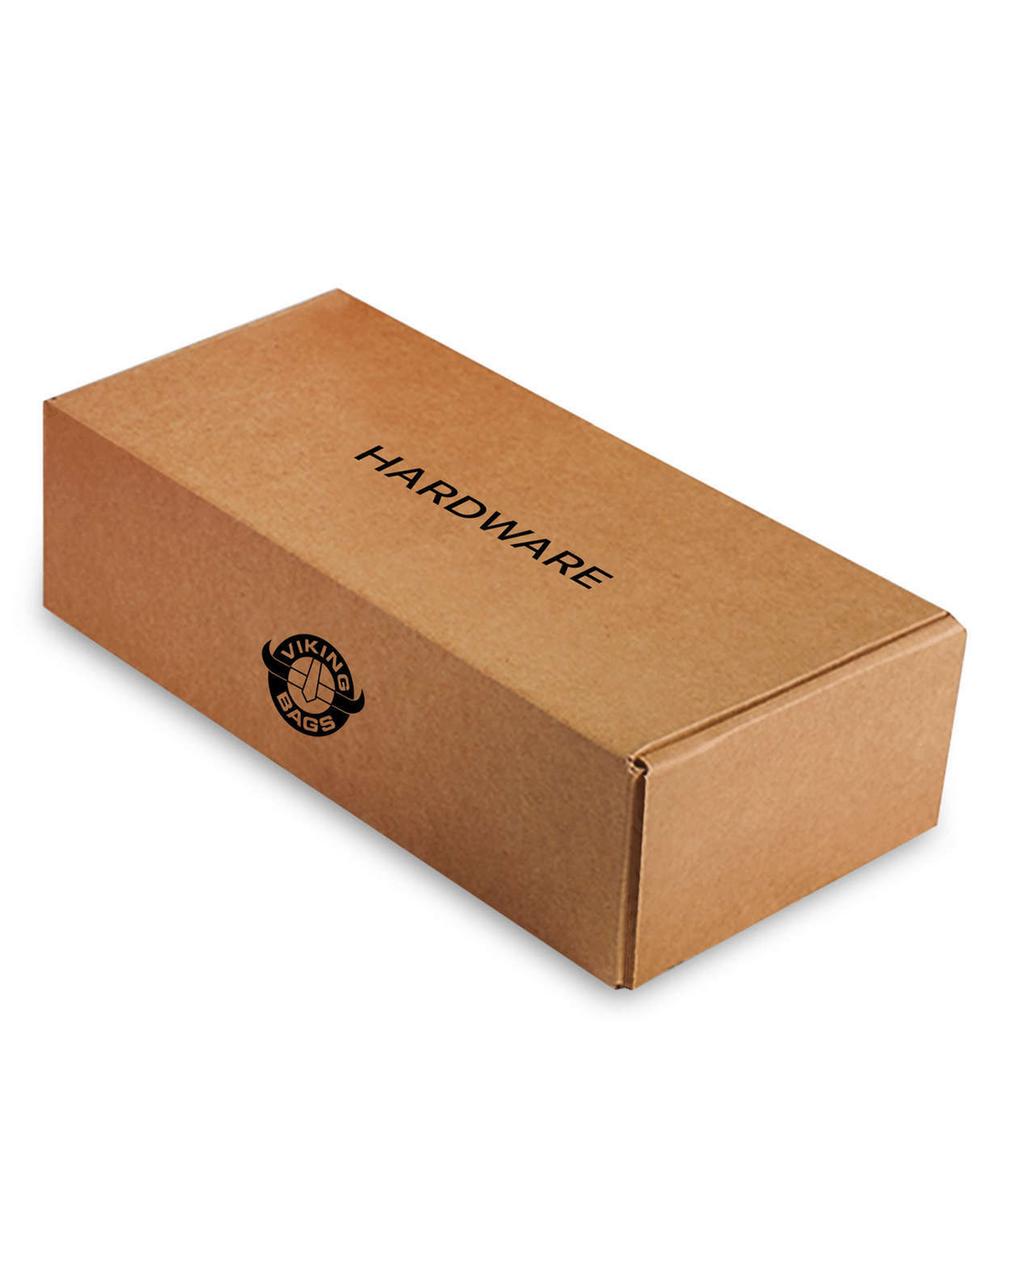 Triumph Rocket III Roadster SS Slanted Medium Motorcycle Saddlebags Box